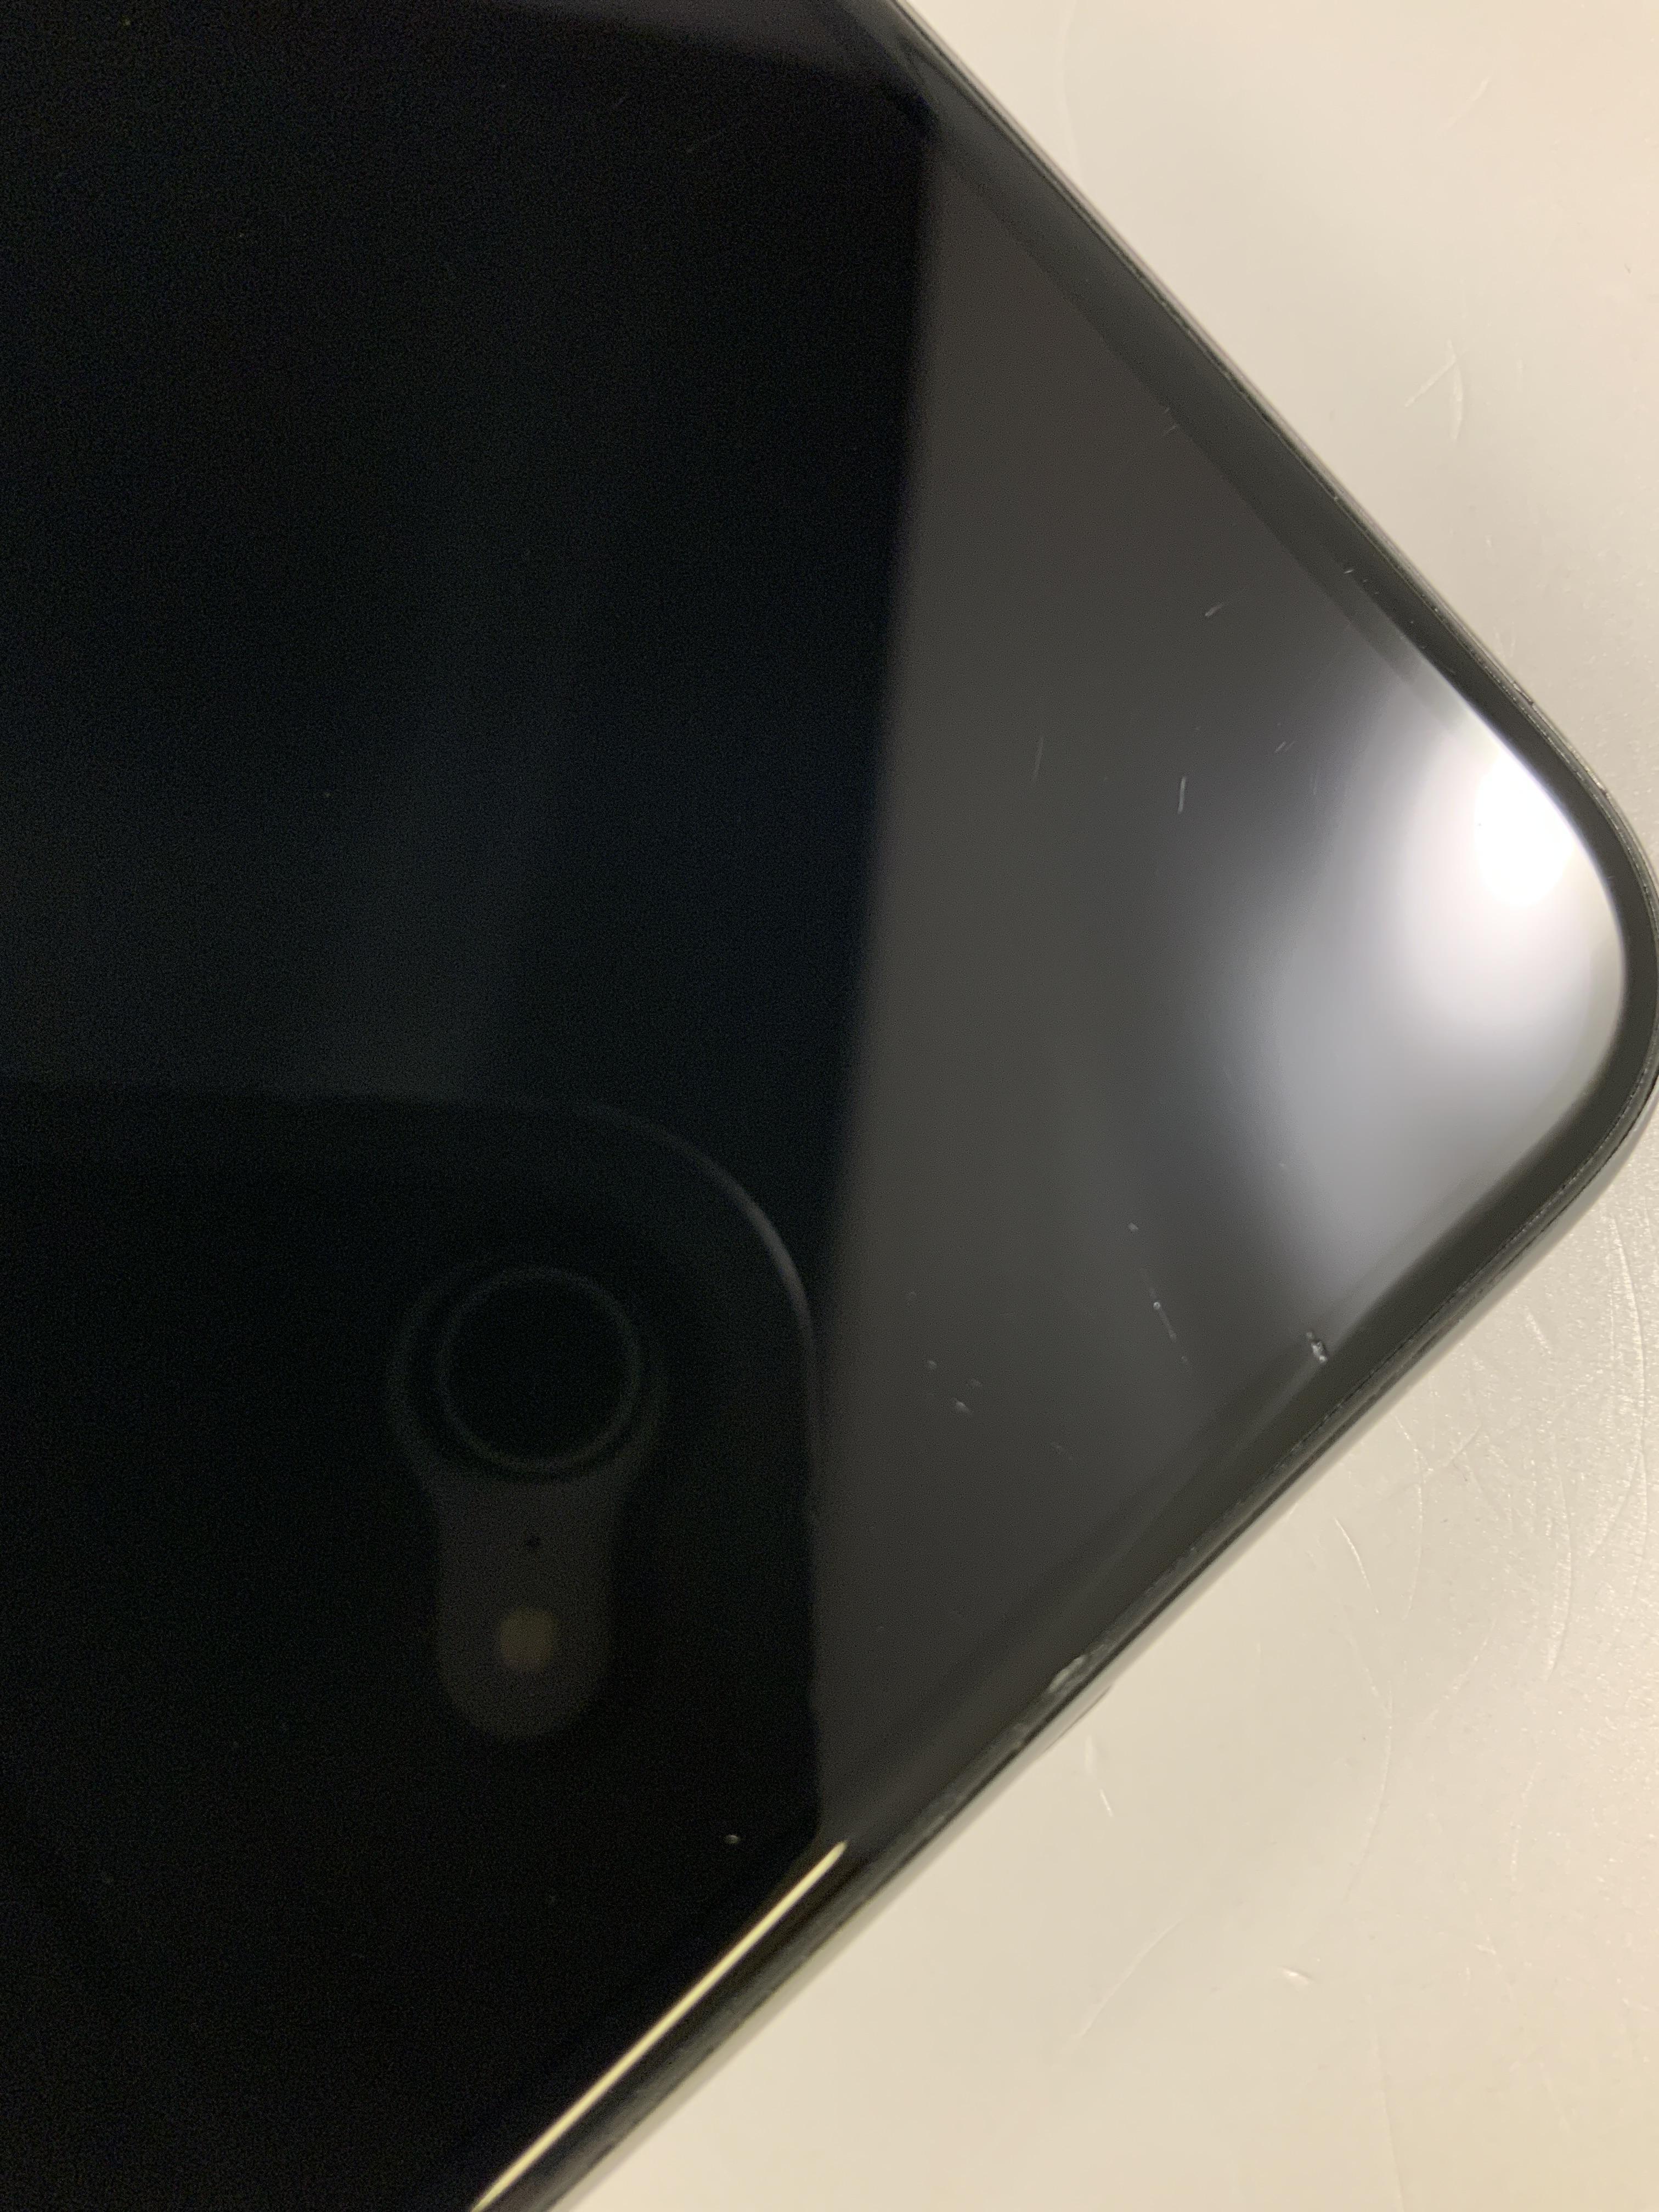 iPhone 11 Pro 64GB, 64GB, Space Gray, bild 3